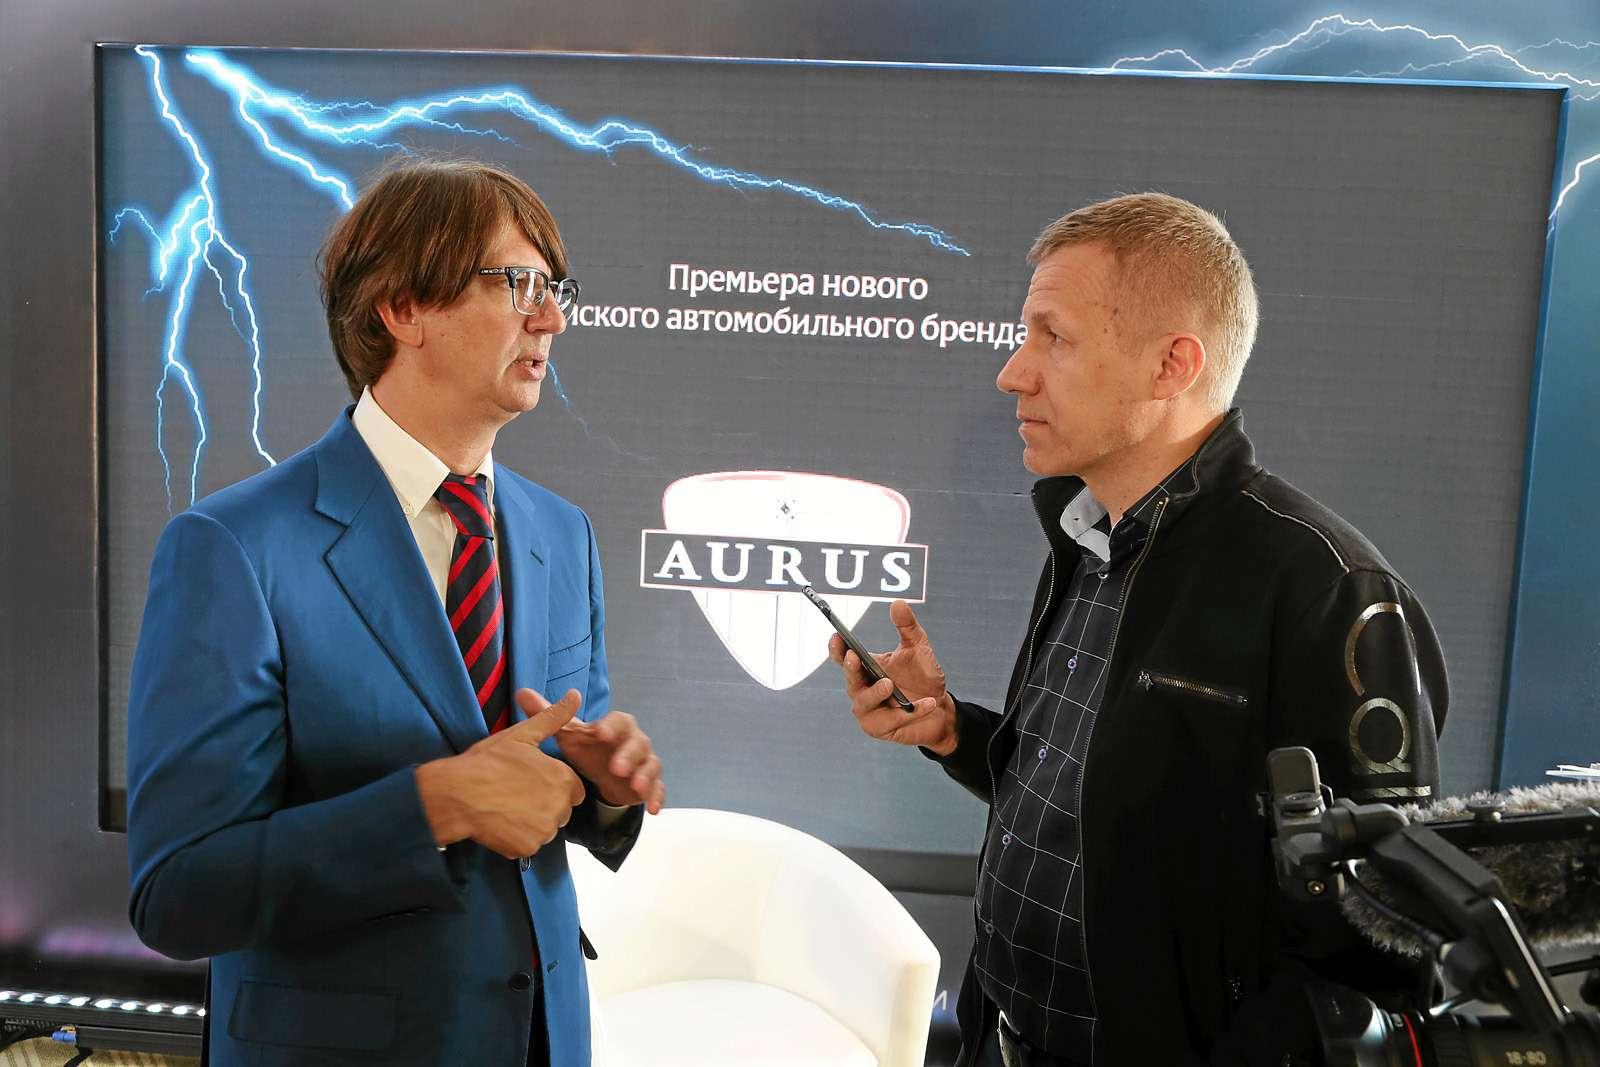 Забудьте про Кортеж: представлен новый российский бренд Aurus— фото 872969